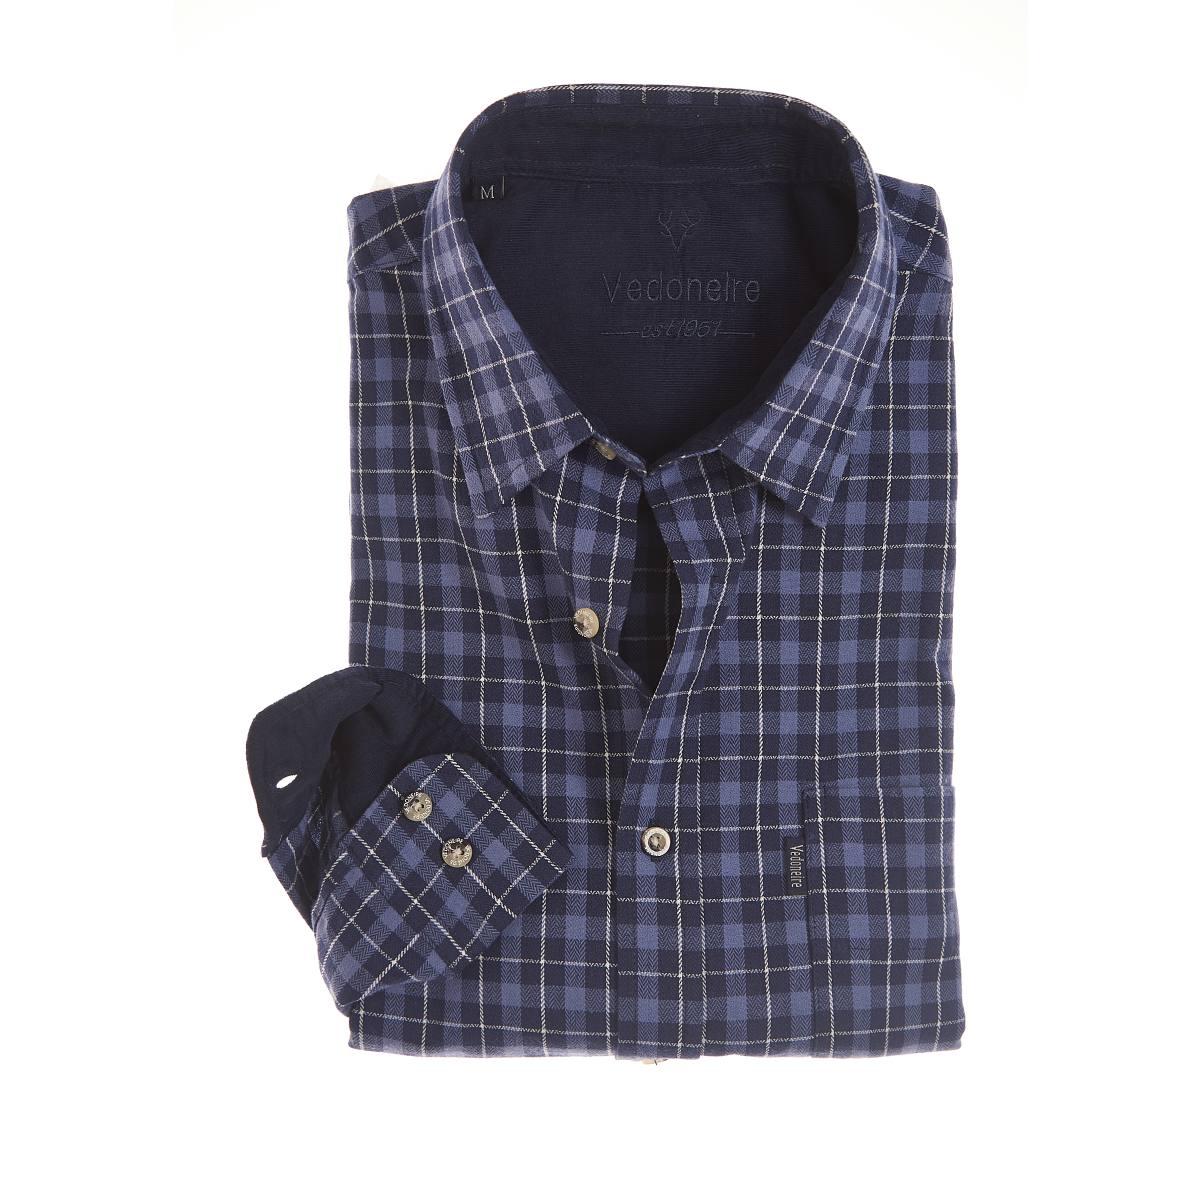 Vedoneire Shirt Brushed Cotton Plaid Pilbara Blue | Restoration Yard